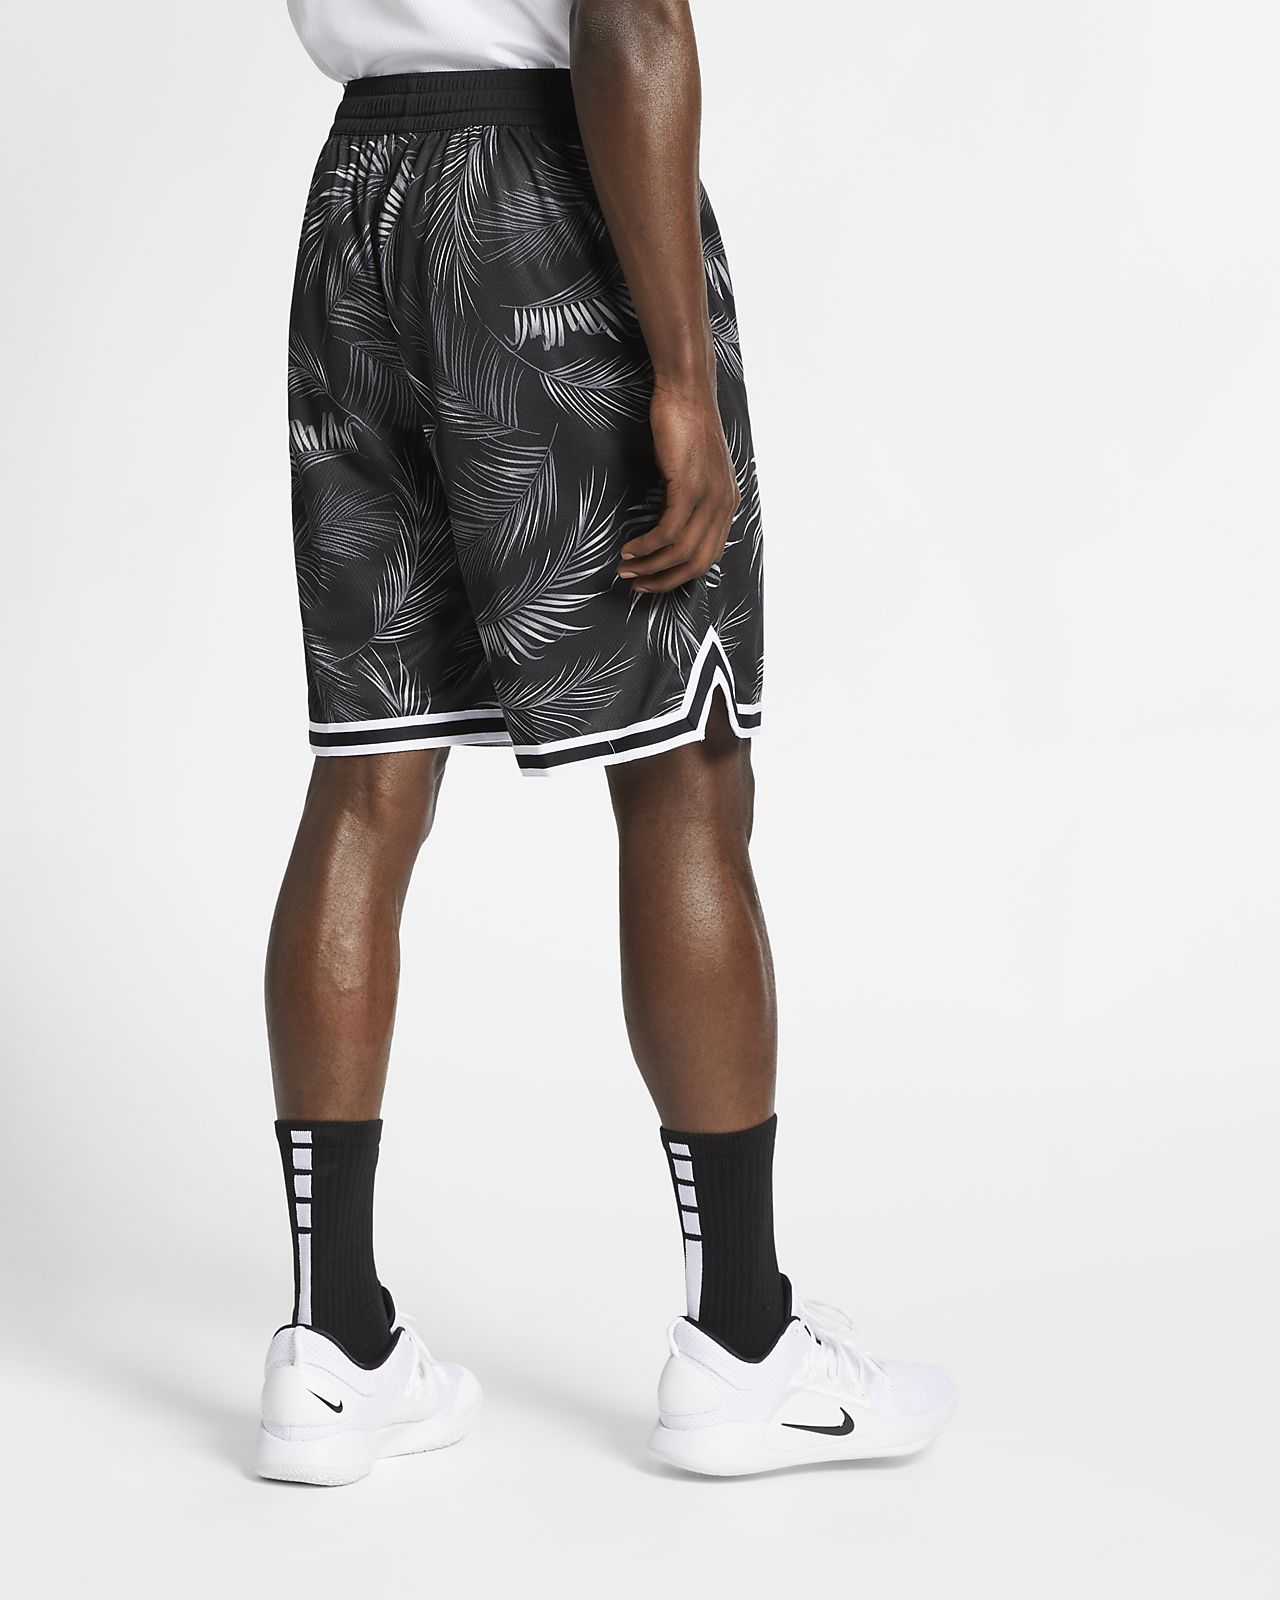 7be60d06de9 Nike Dri-FIT DNA Men's Basketball Shorts. Nike.com